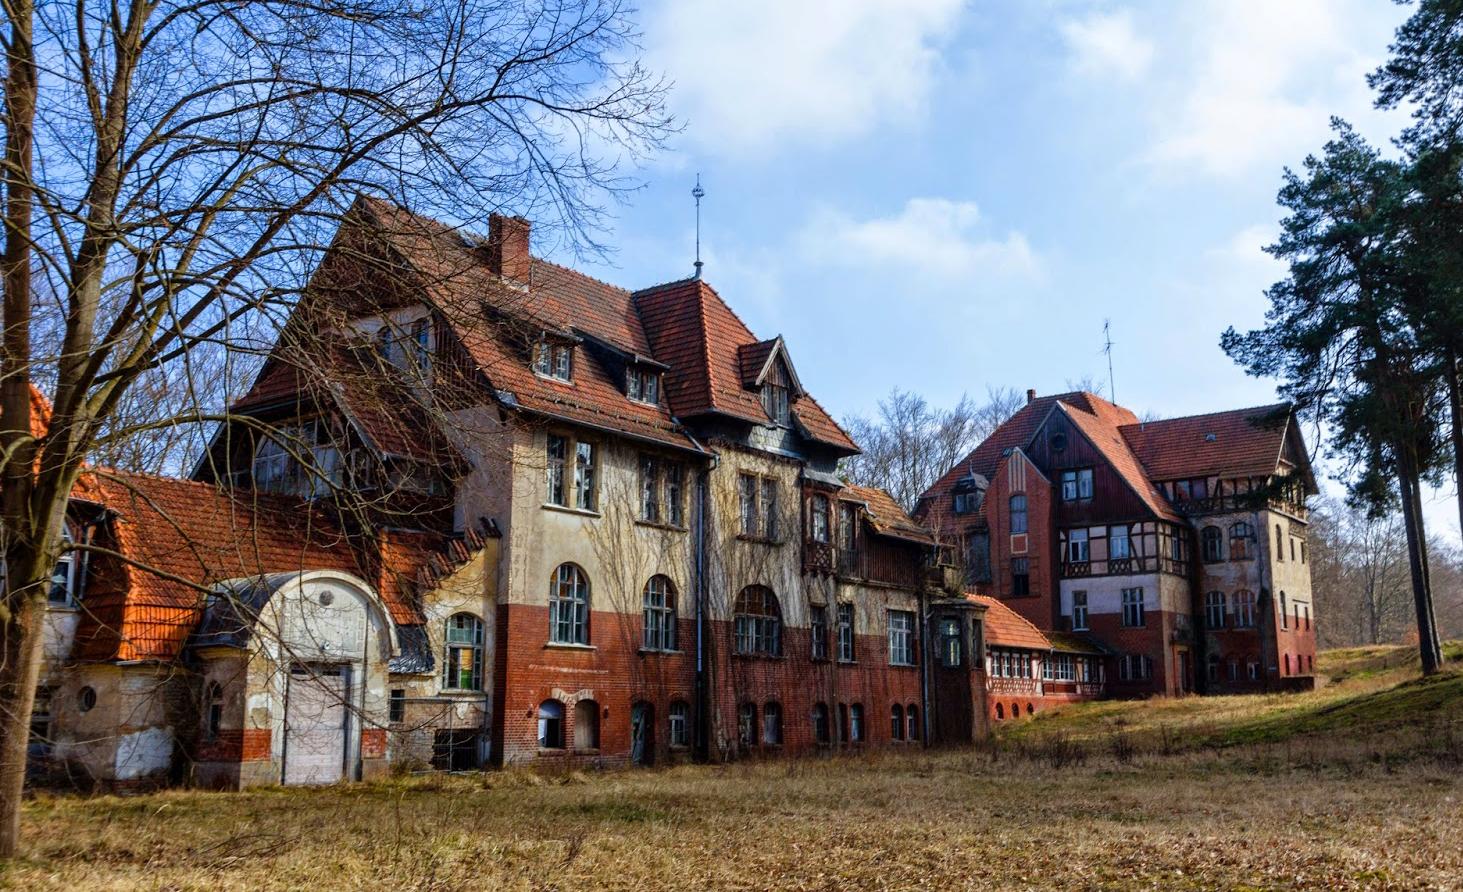 06_hohenlychen_nemetorszag_germany_deutschland_forras-abandoned_berlin.jpg